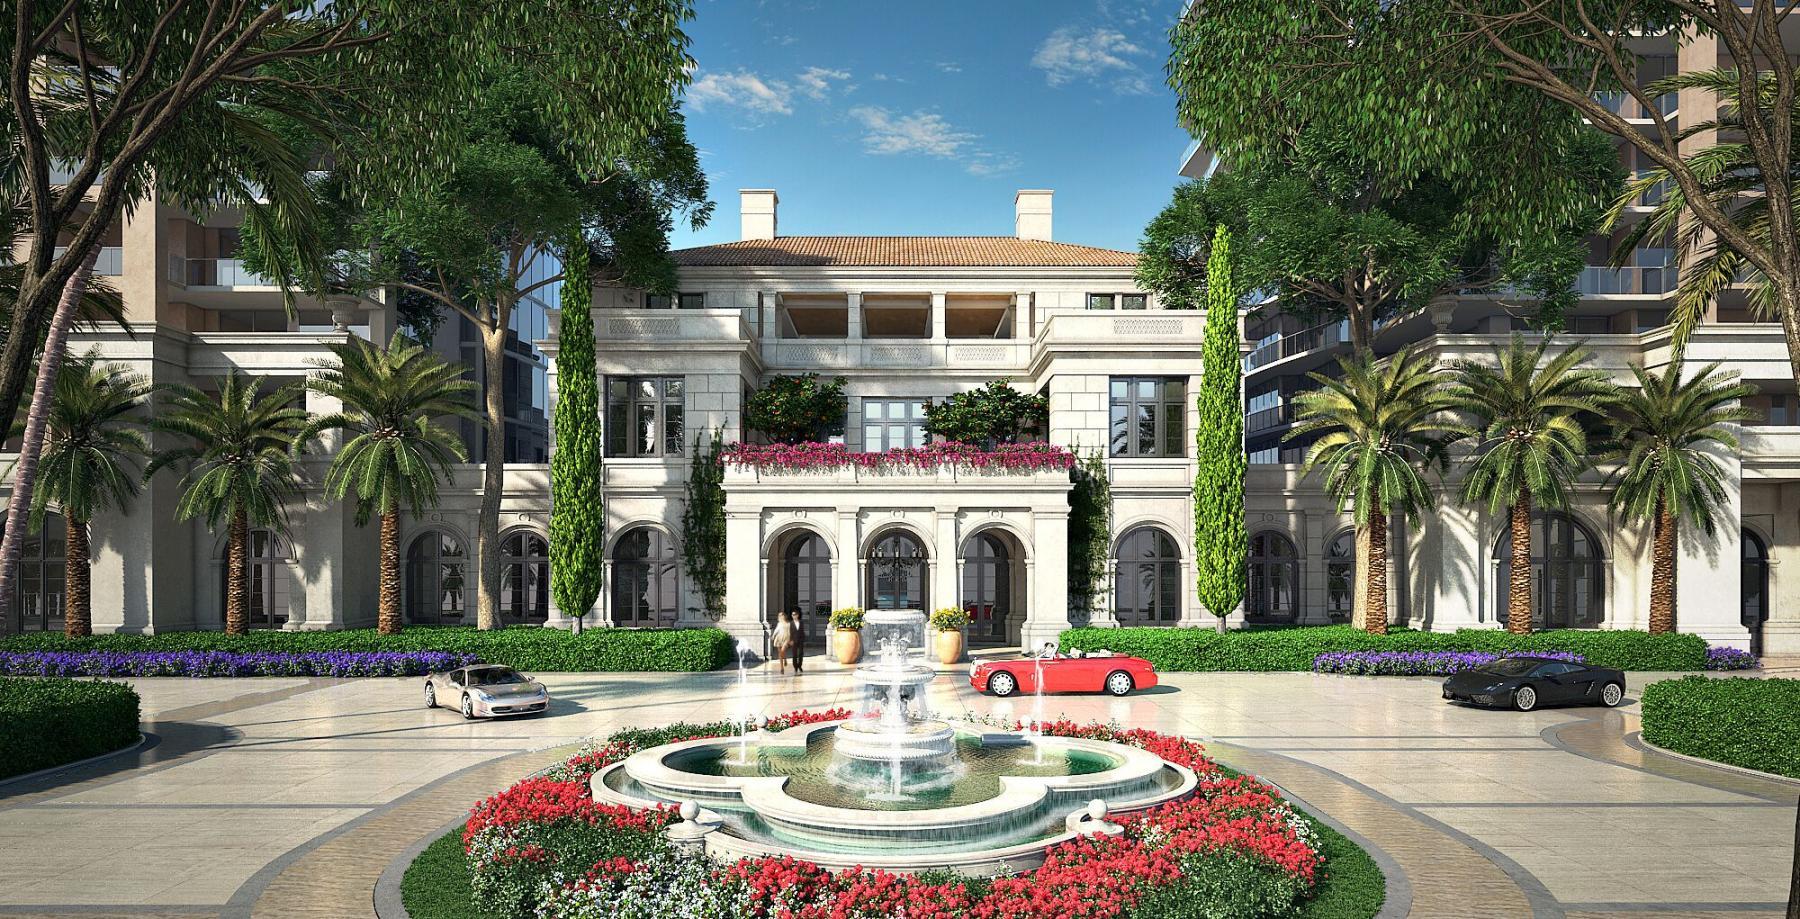 The Estates at Acqualina Condos for sale